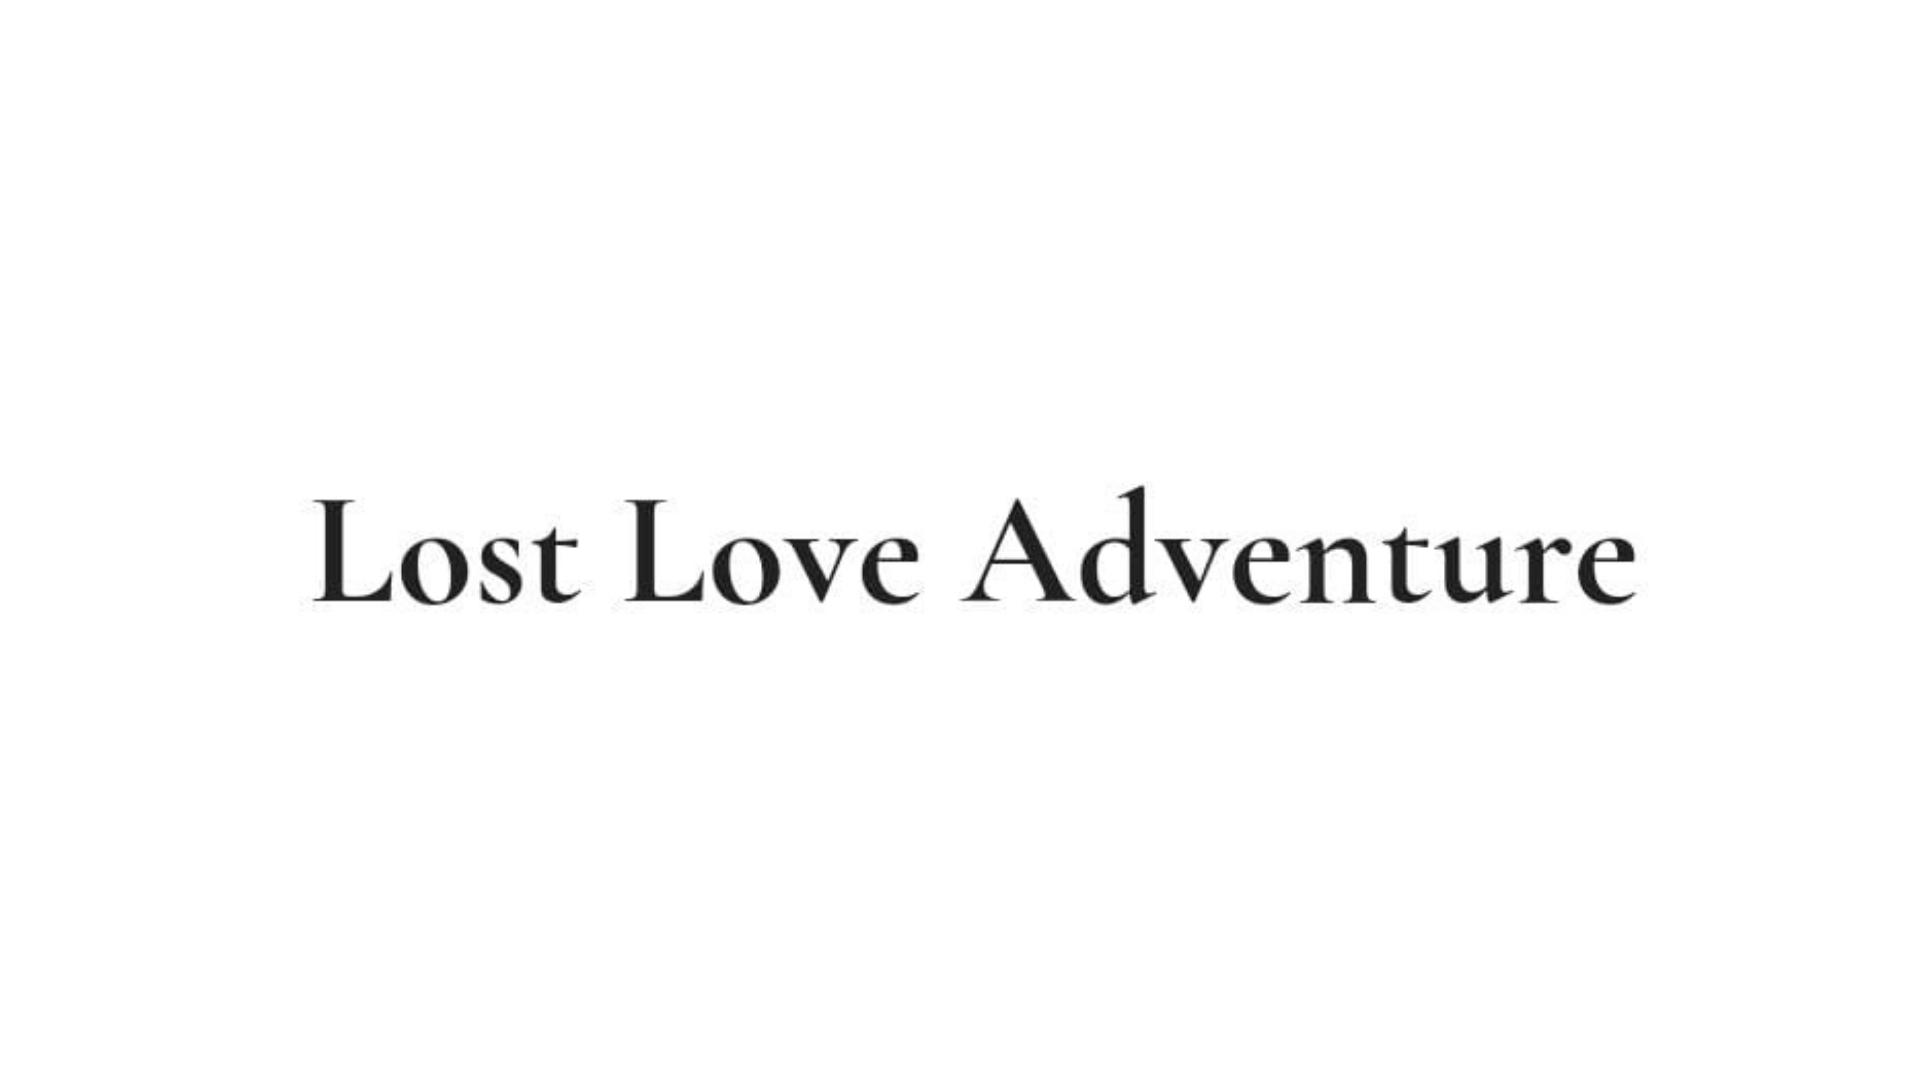 Lost Love Adventure Testimonial